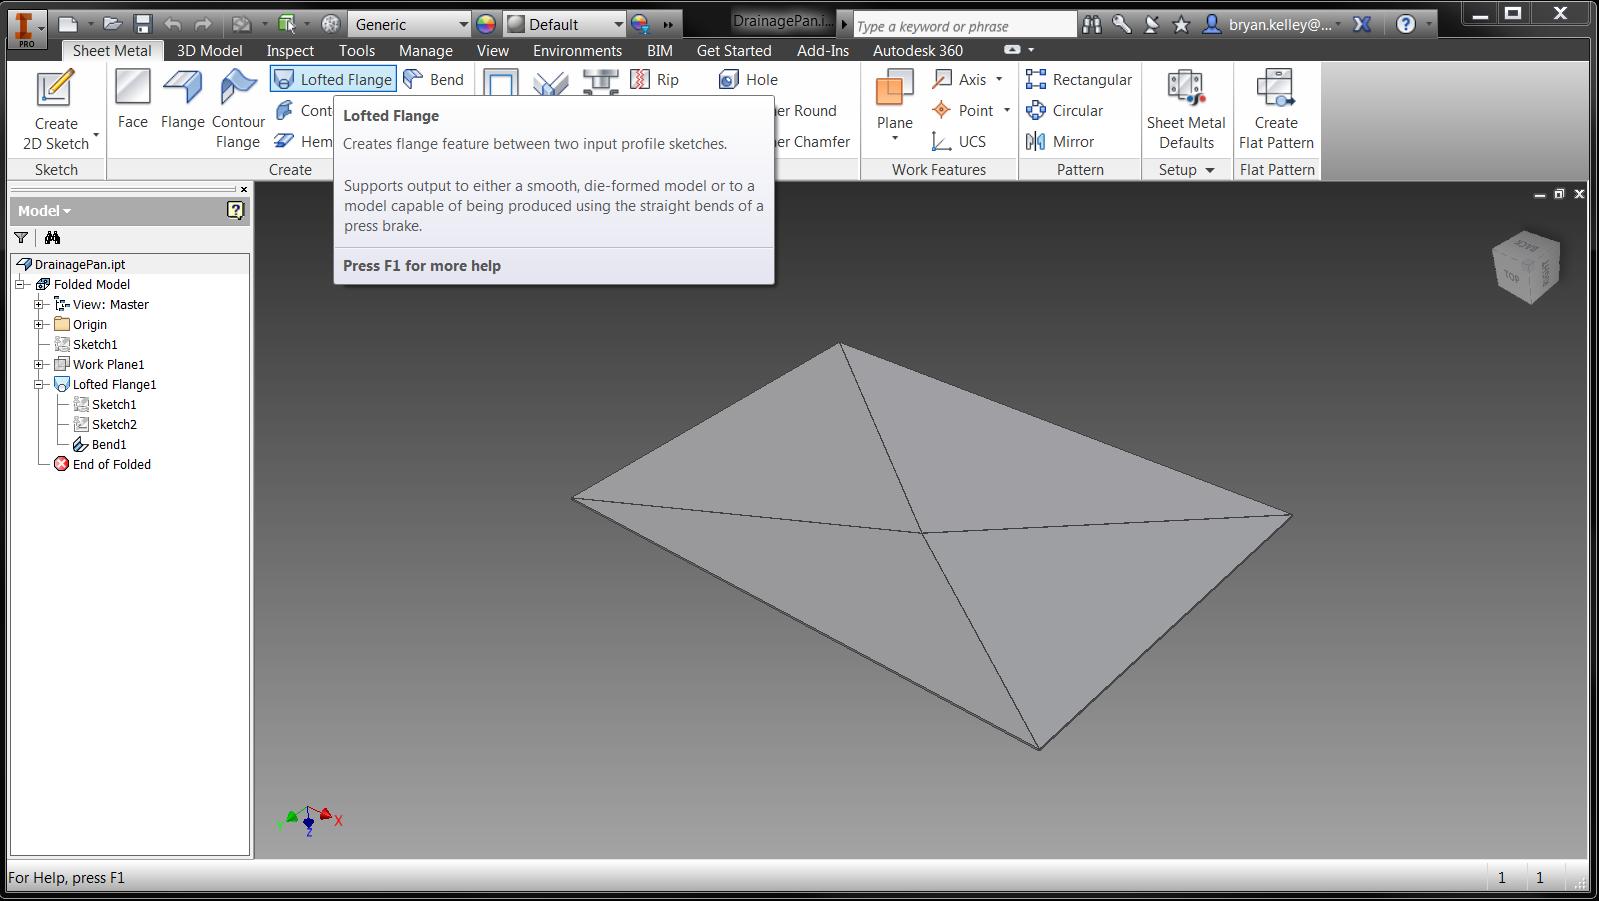 Drainage Pans For Sheet Metal Autodesk Community